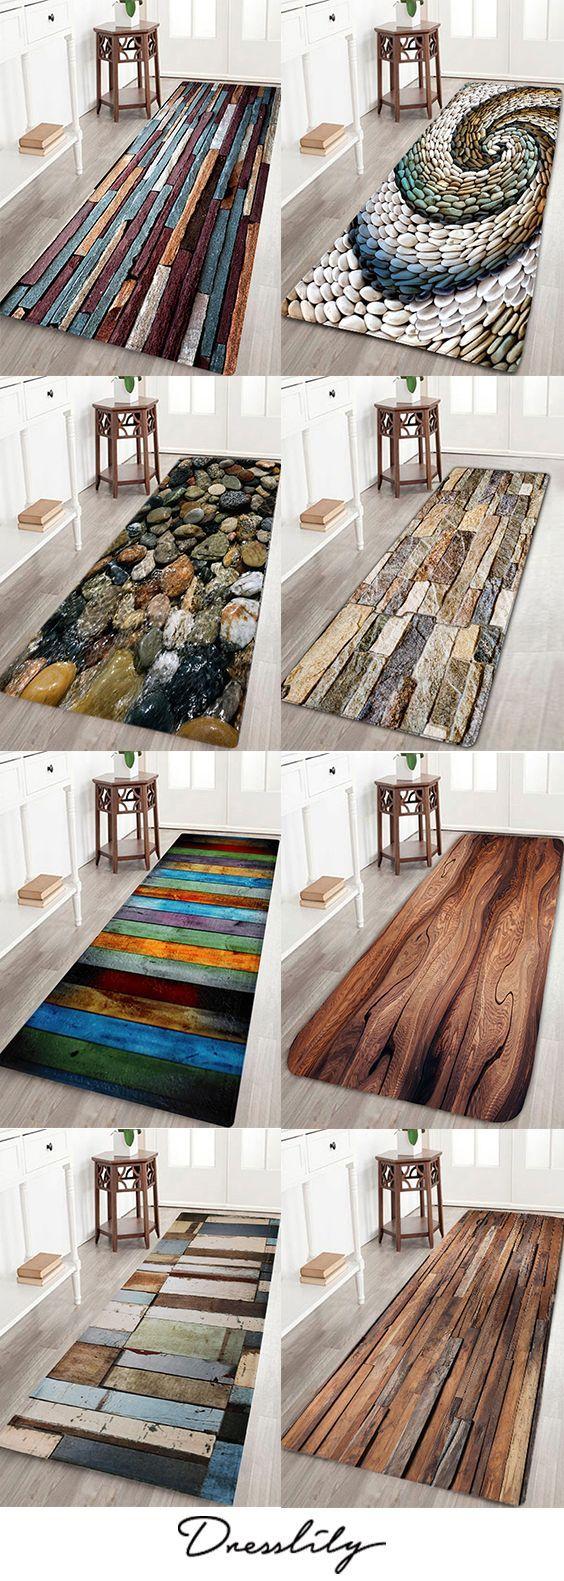 46 best Bath rugs & Mats images on Pinterest | Große teppiche ...